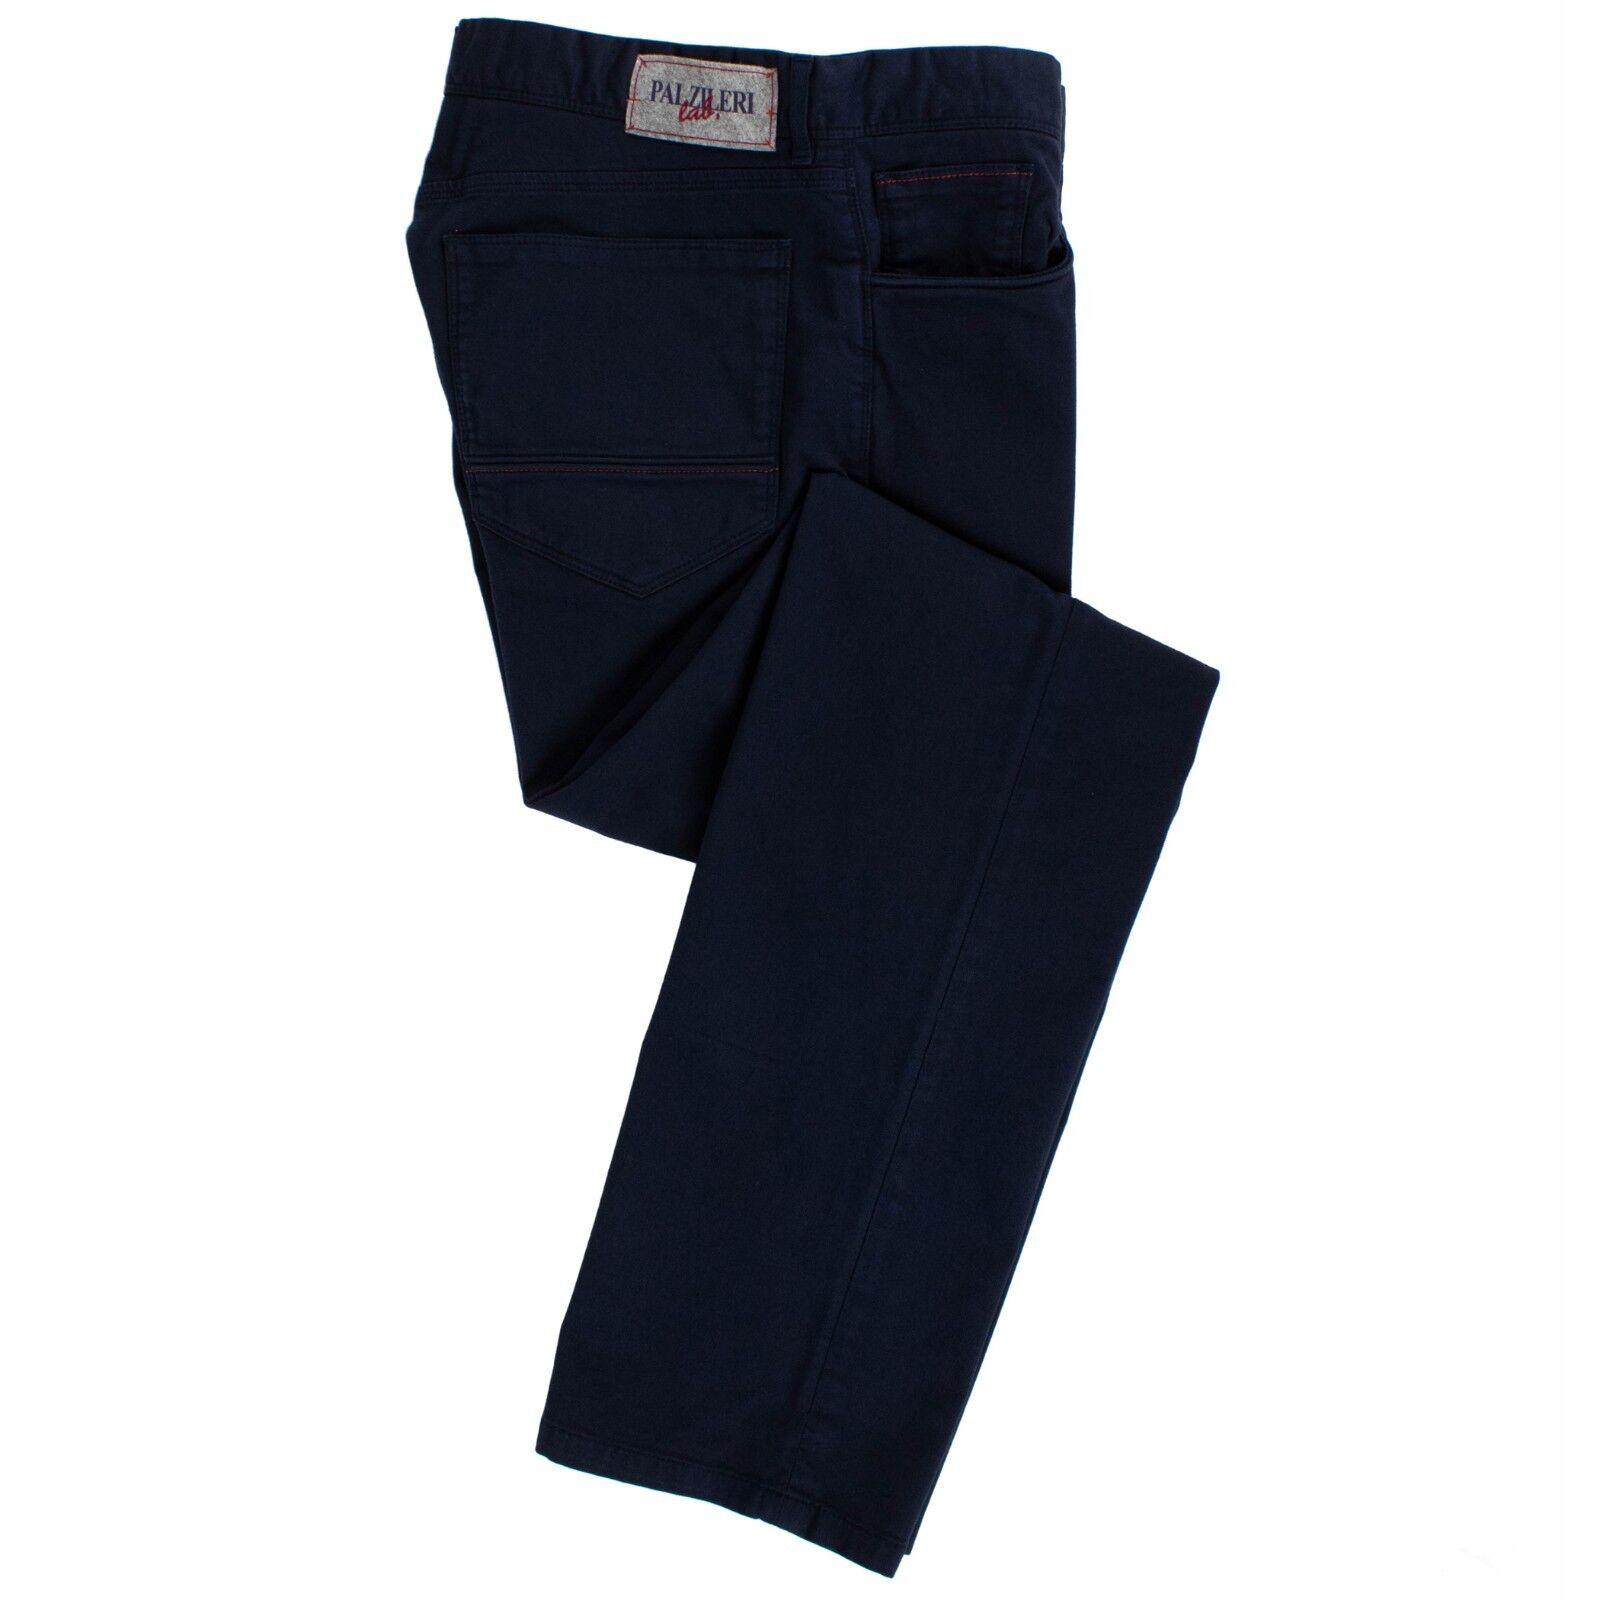 Nuovo Pal Zileri Laboratorio Blu Navy Misto Cotone Pantaloni Taglia 50 34